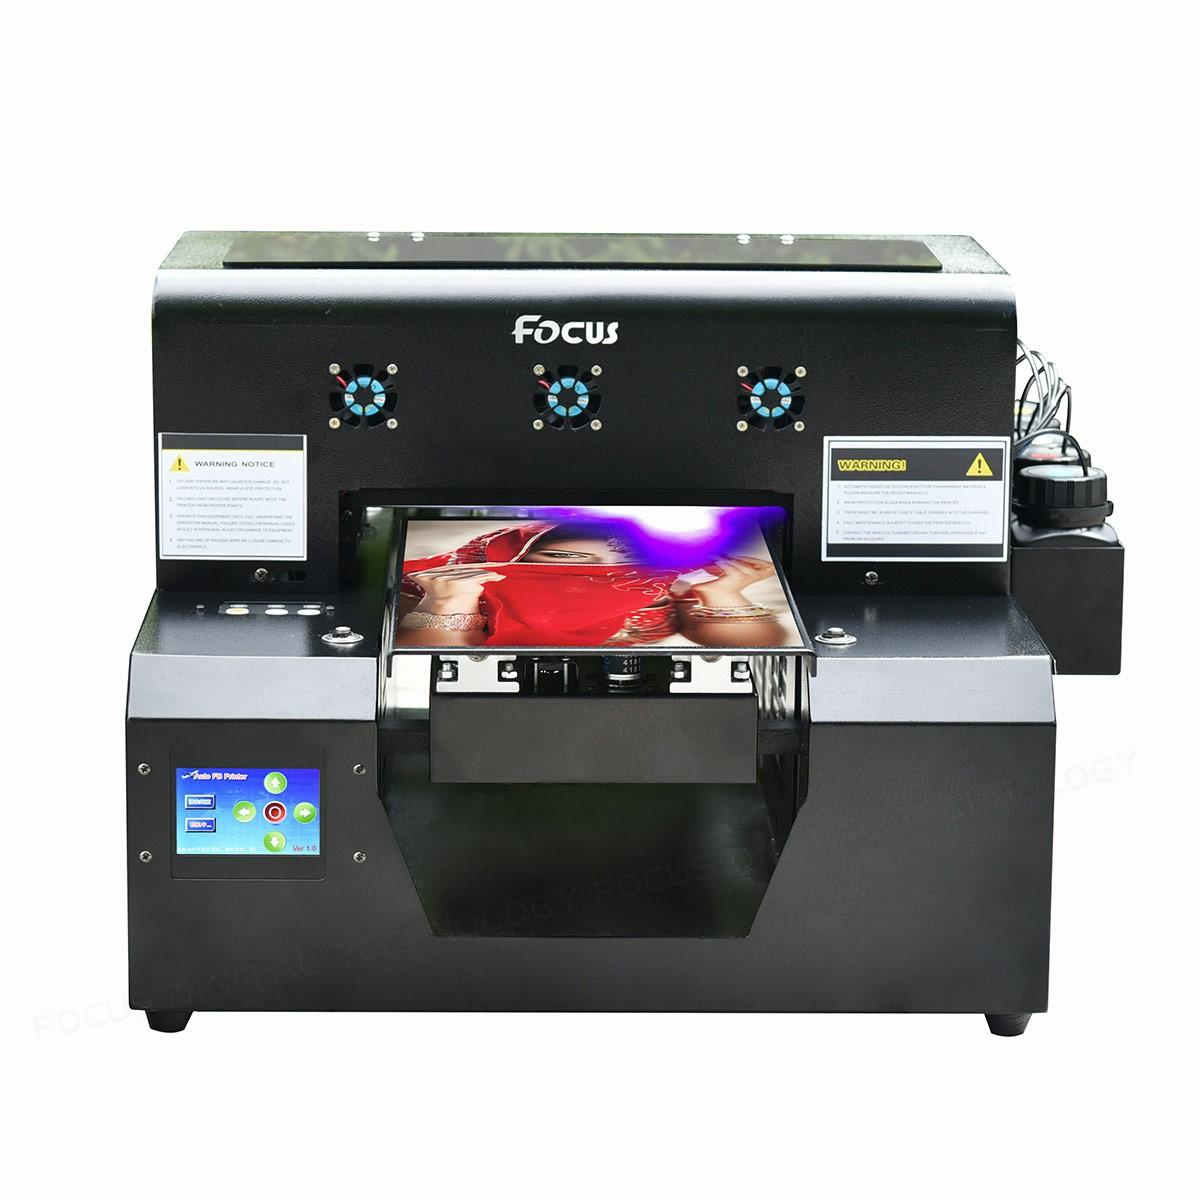 https://www.focus-printer.com/img/sapphire_jet_x_a4_small_phone_case_uv_printer.jpg